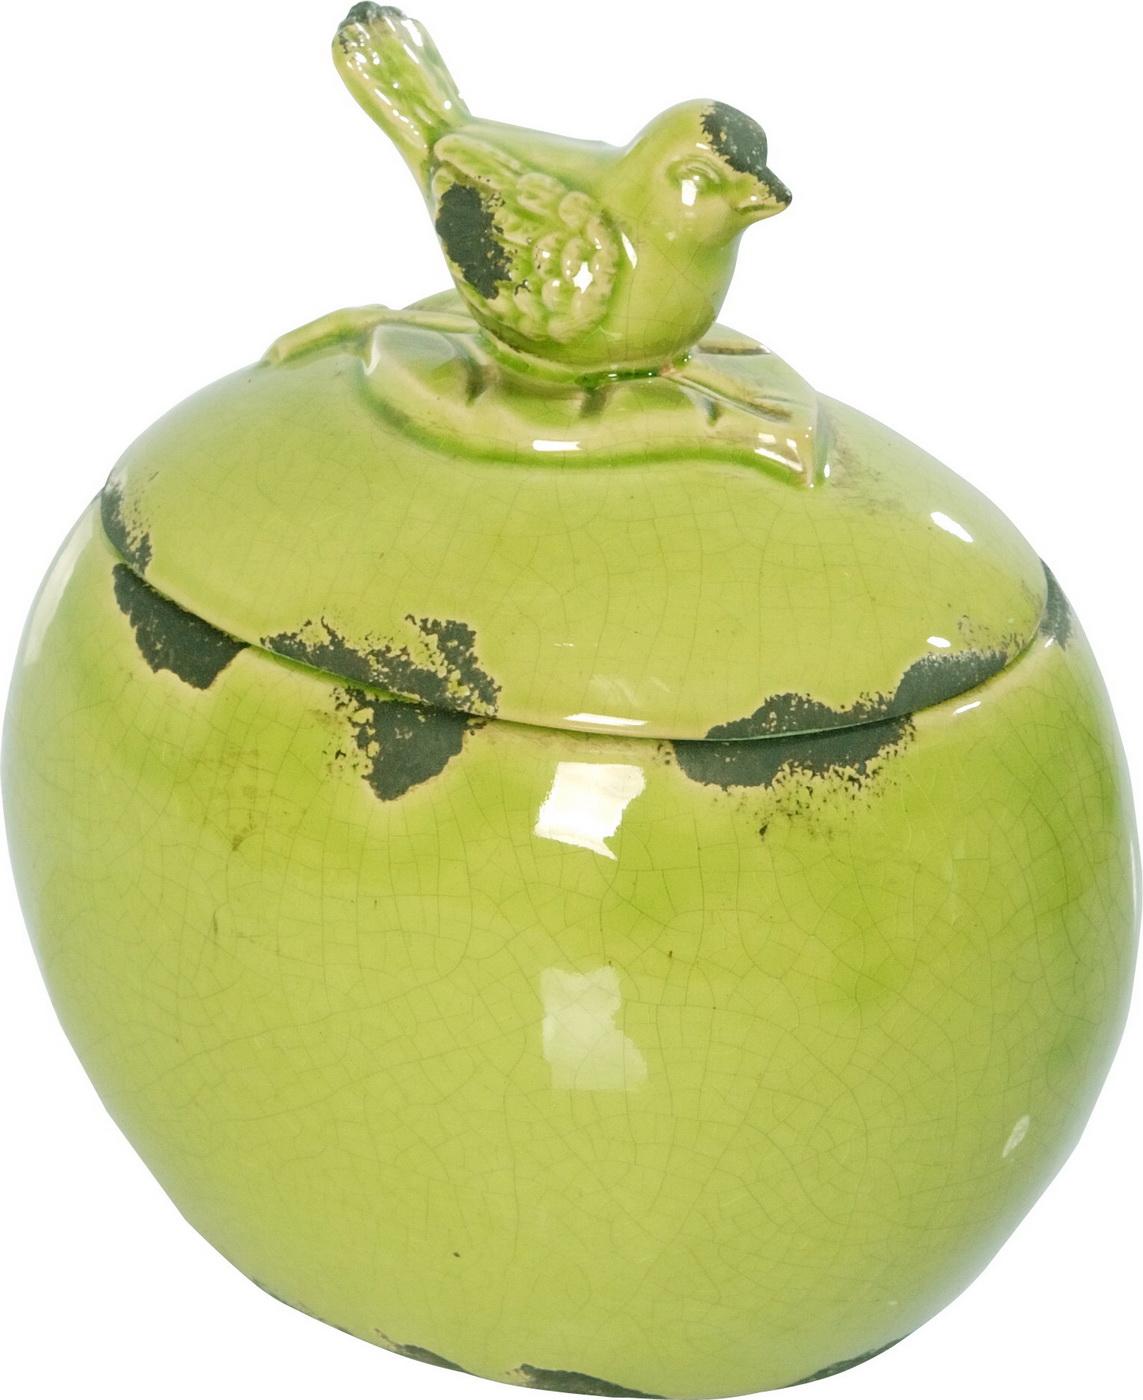 {} ARTEVALUCE Ваза с крышкой Птички Цвет: Зеленый (13х17х18 см) artevaluce ваза с крышкой orlenda цвет зеленый 11х17х51 см